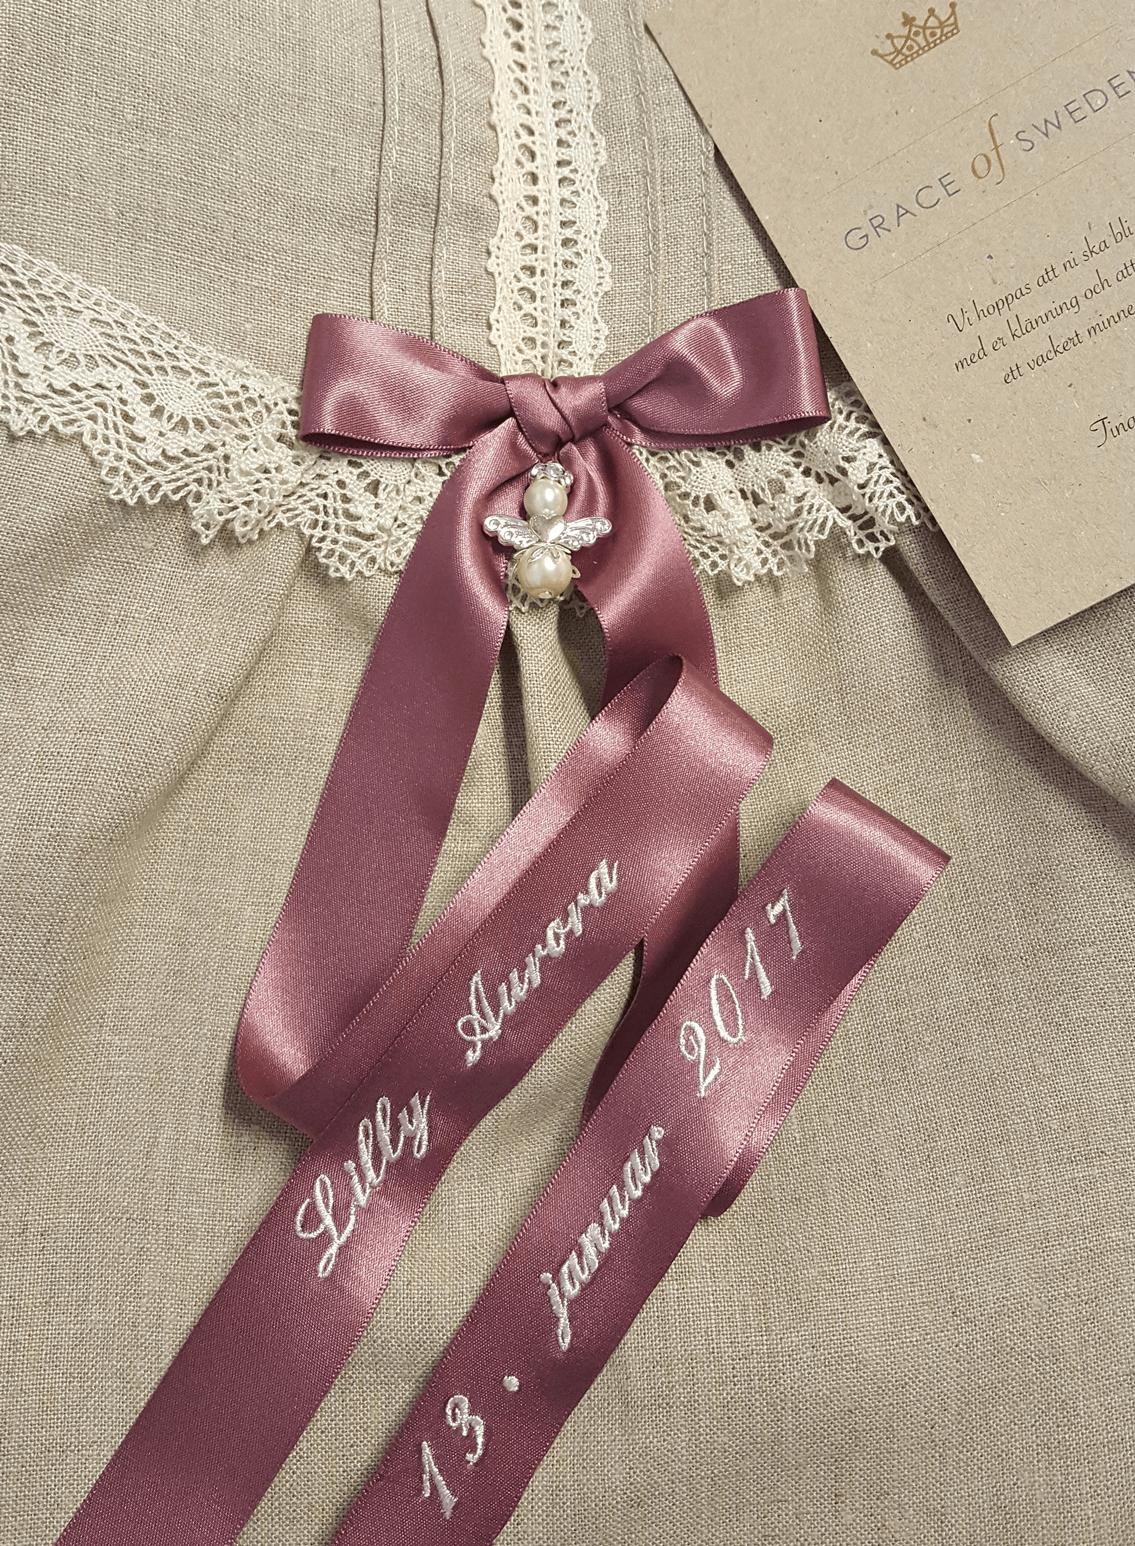 Dåpslue - Matrushatt til sjømannsdressen